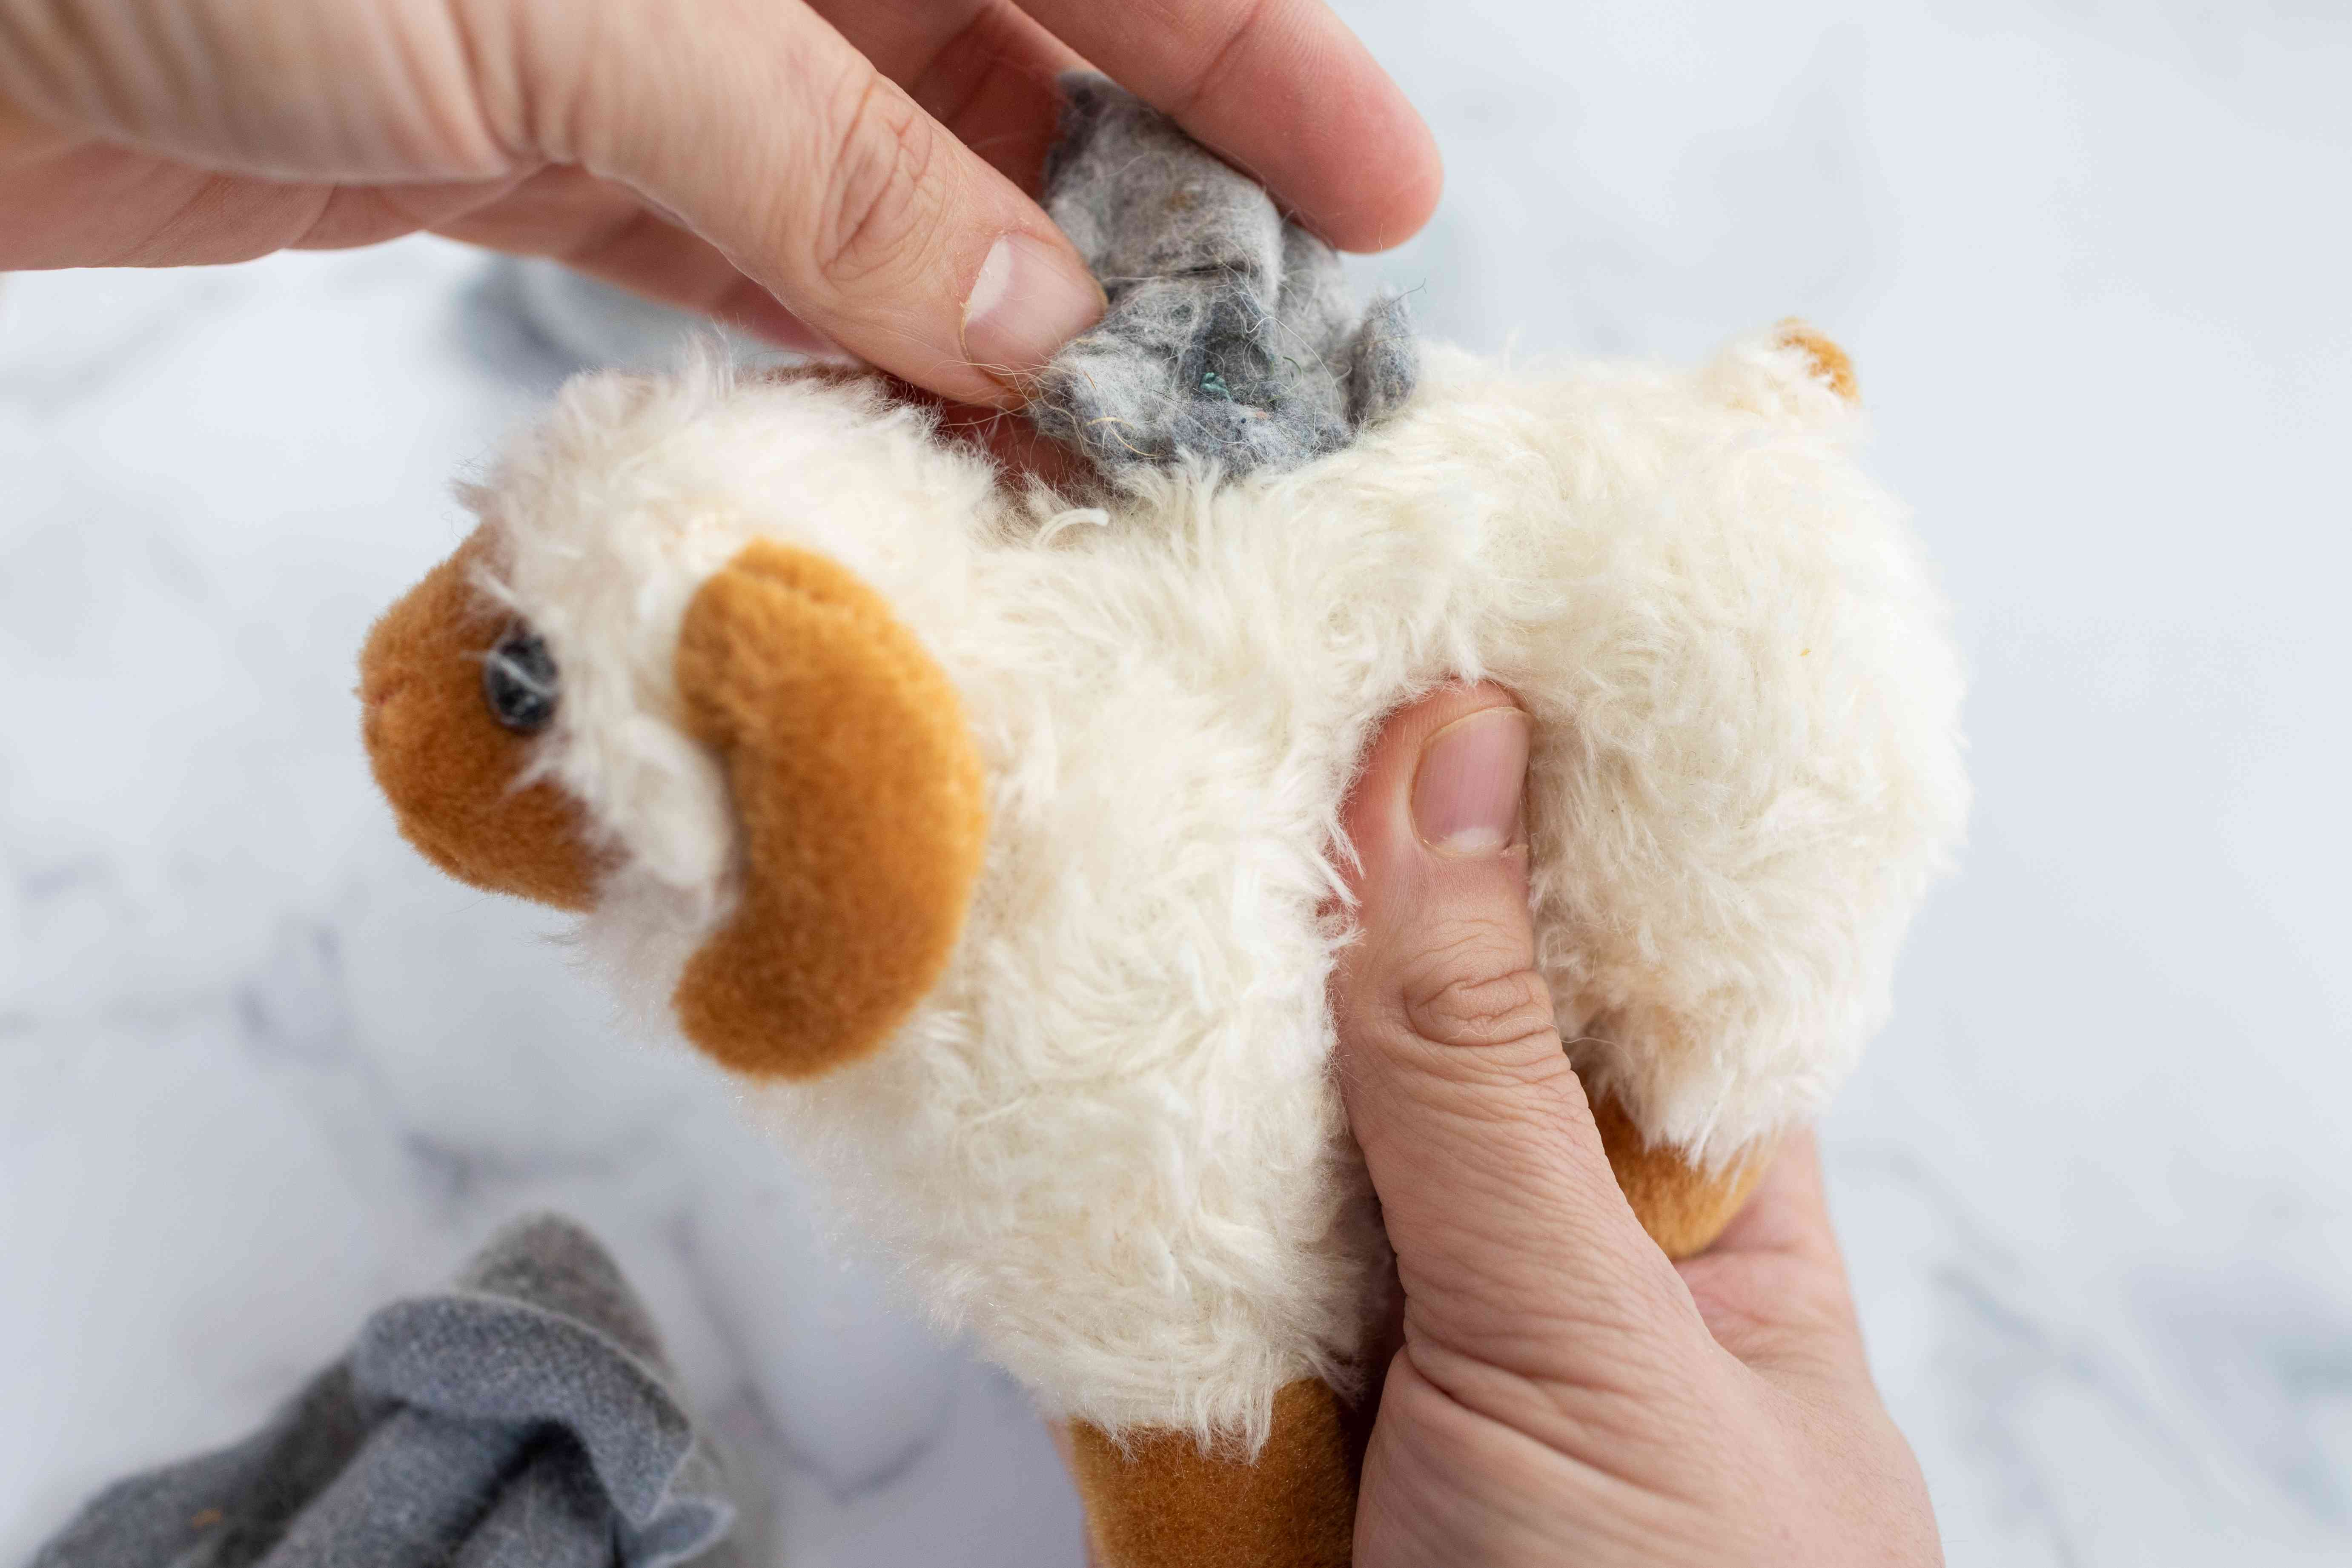 hand stuffs old dryer lint into hole of stuffed animal plush sheep